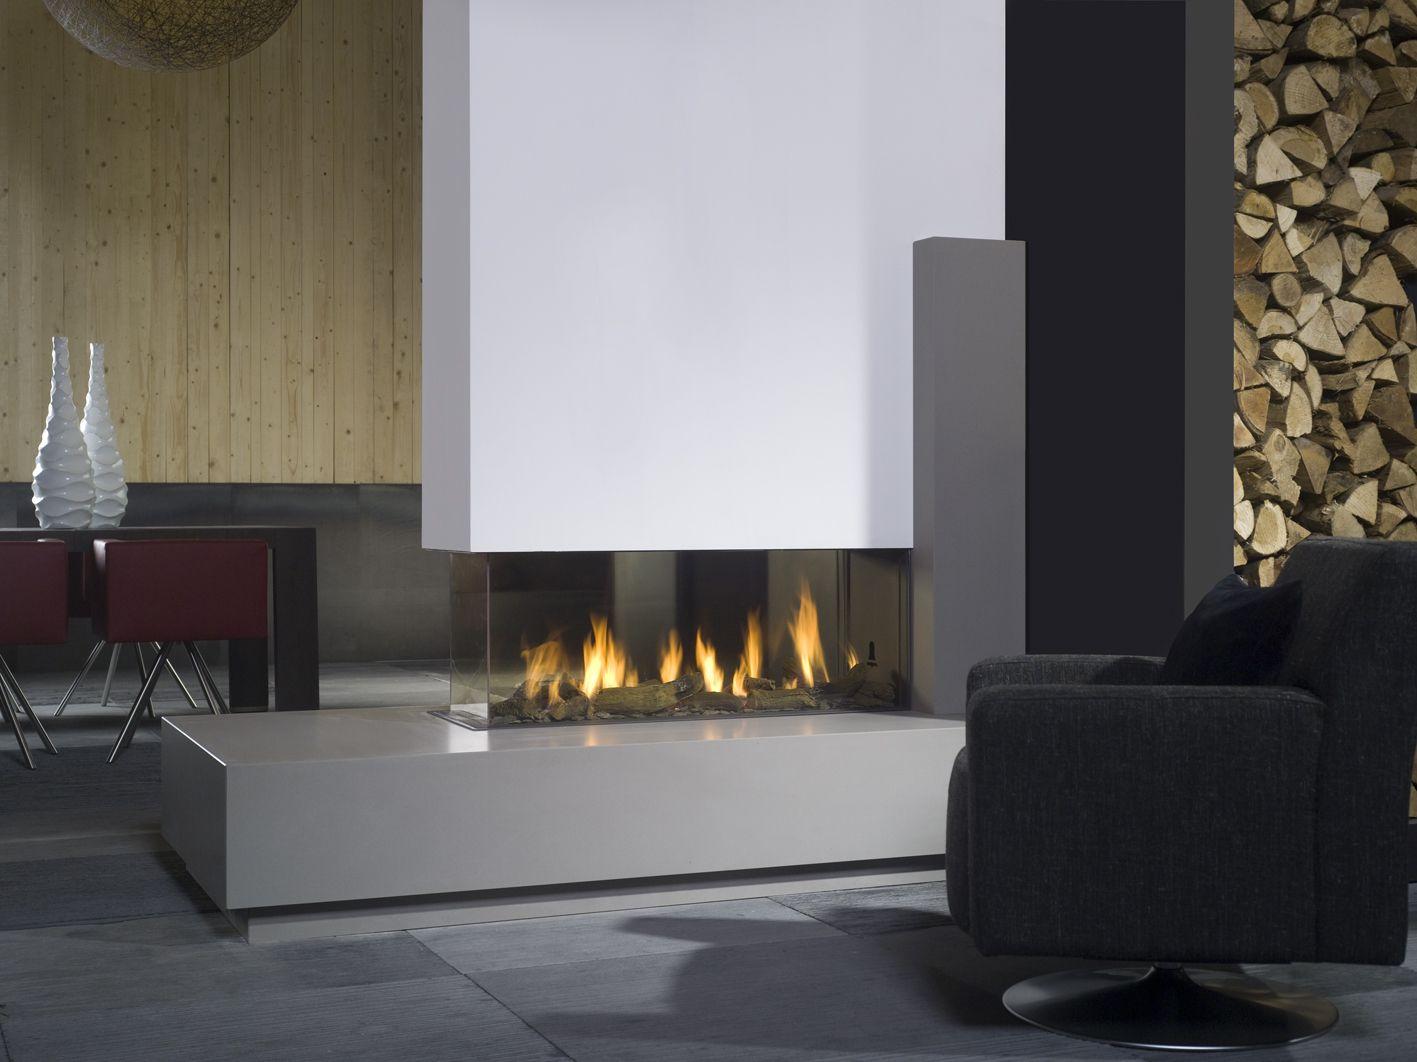 Living Room Fireplace Divider Design Ideas  73 Berrylands New Living Room Divider Design Ideas 2018